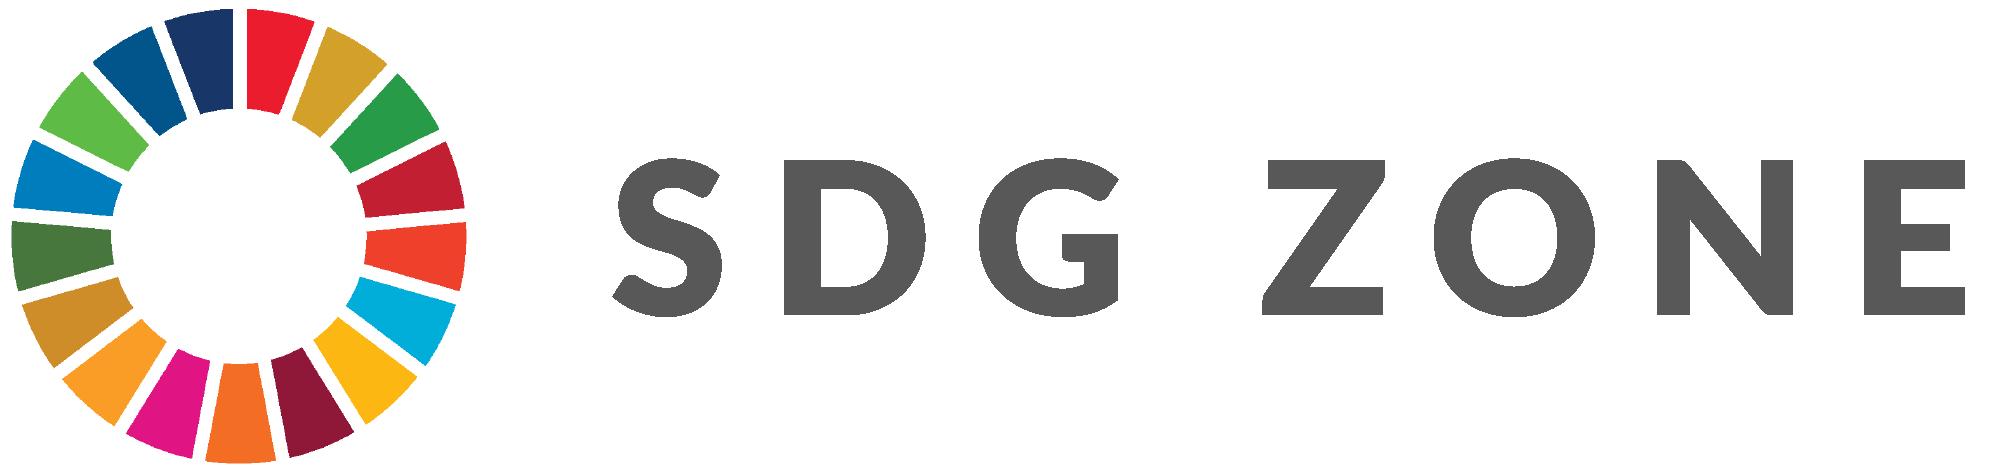 sdgzone-logo.png